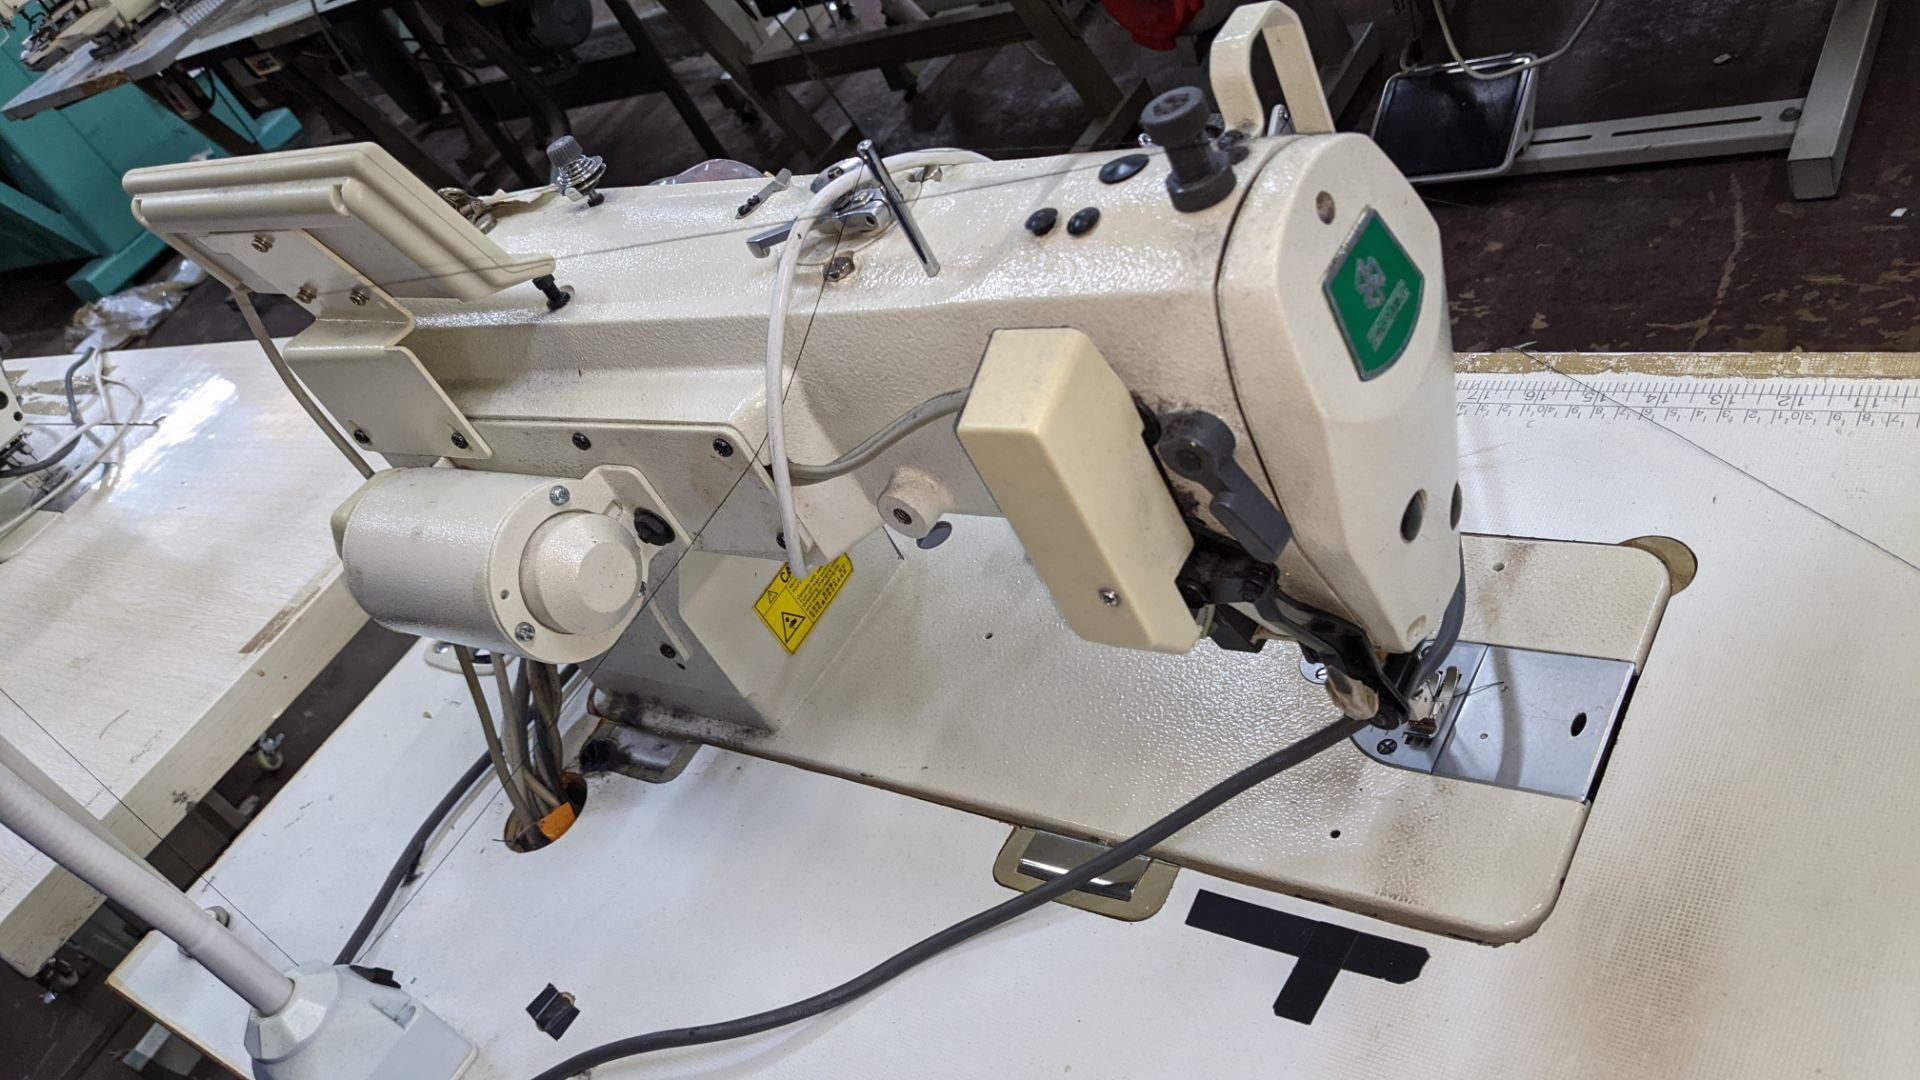 Zoje model ZJ9800A-D3B/PF lockstitch sewing machine with model WR-501 digital controller - Image 12 of 20